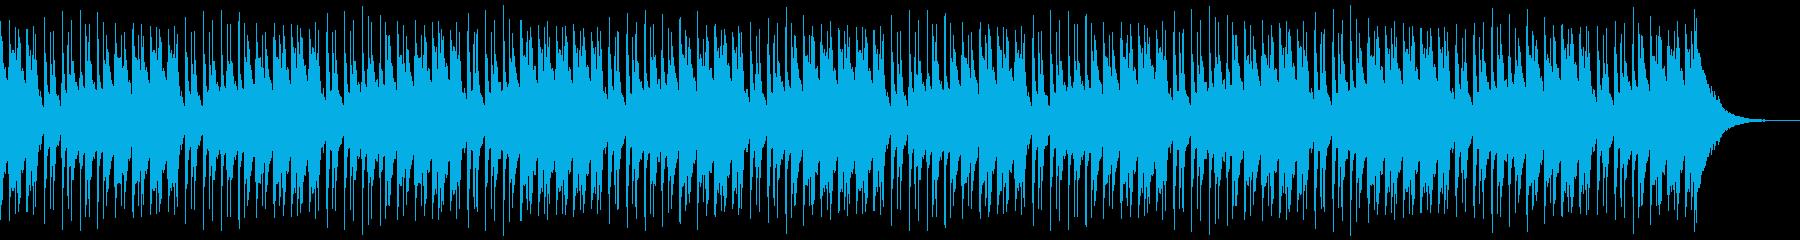 Happy Ukulele 12の再生済みの波形